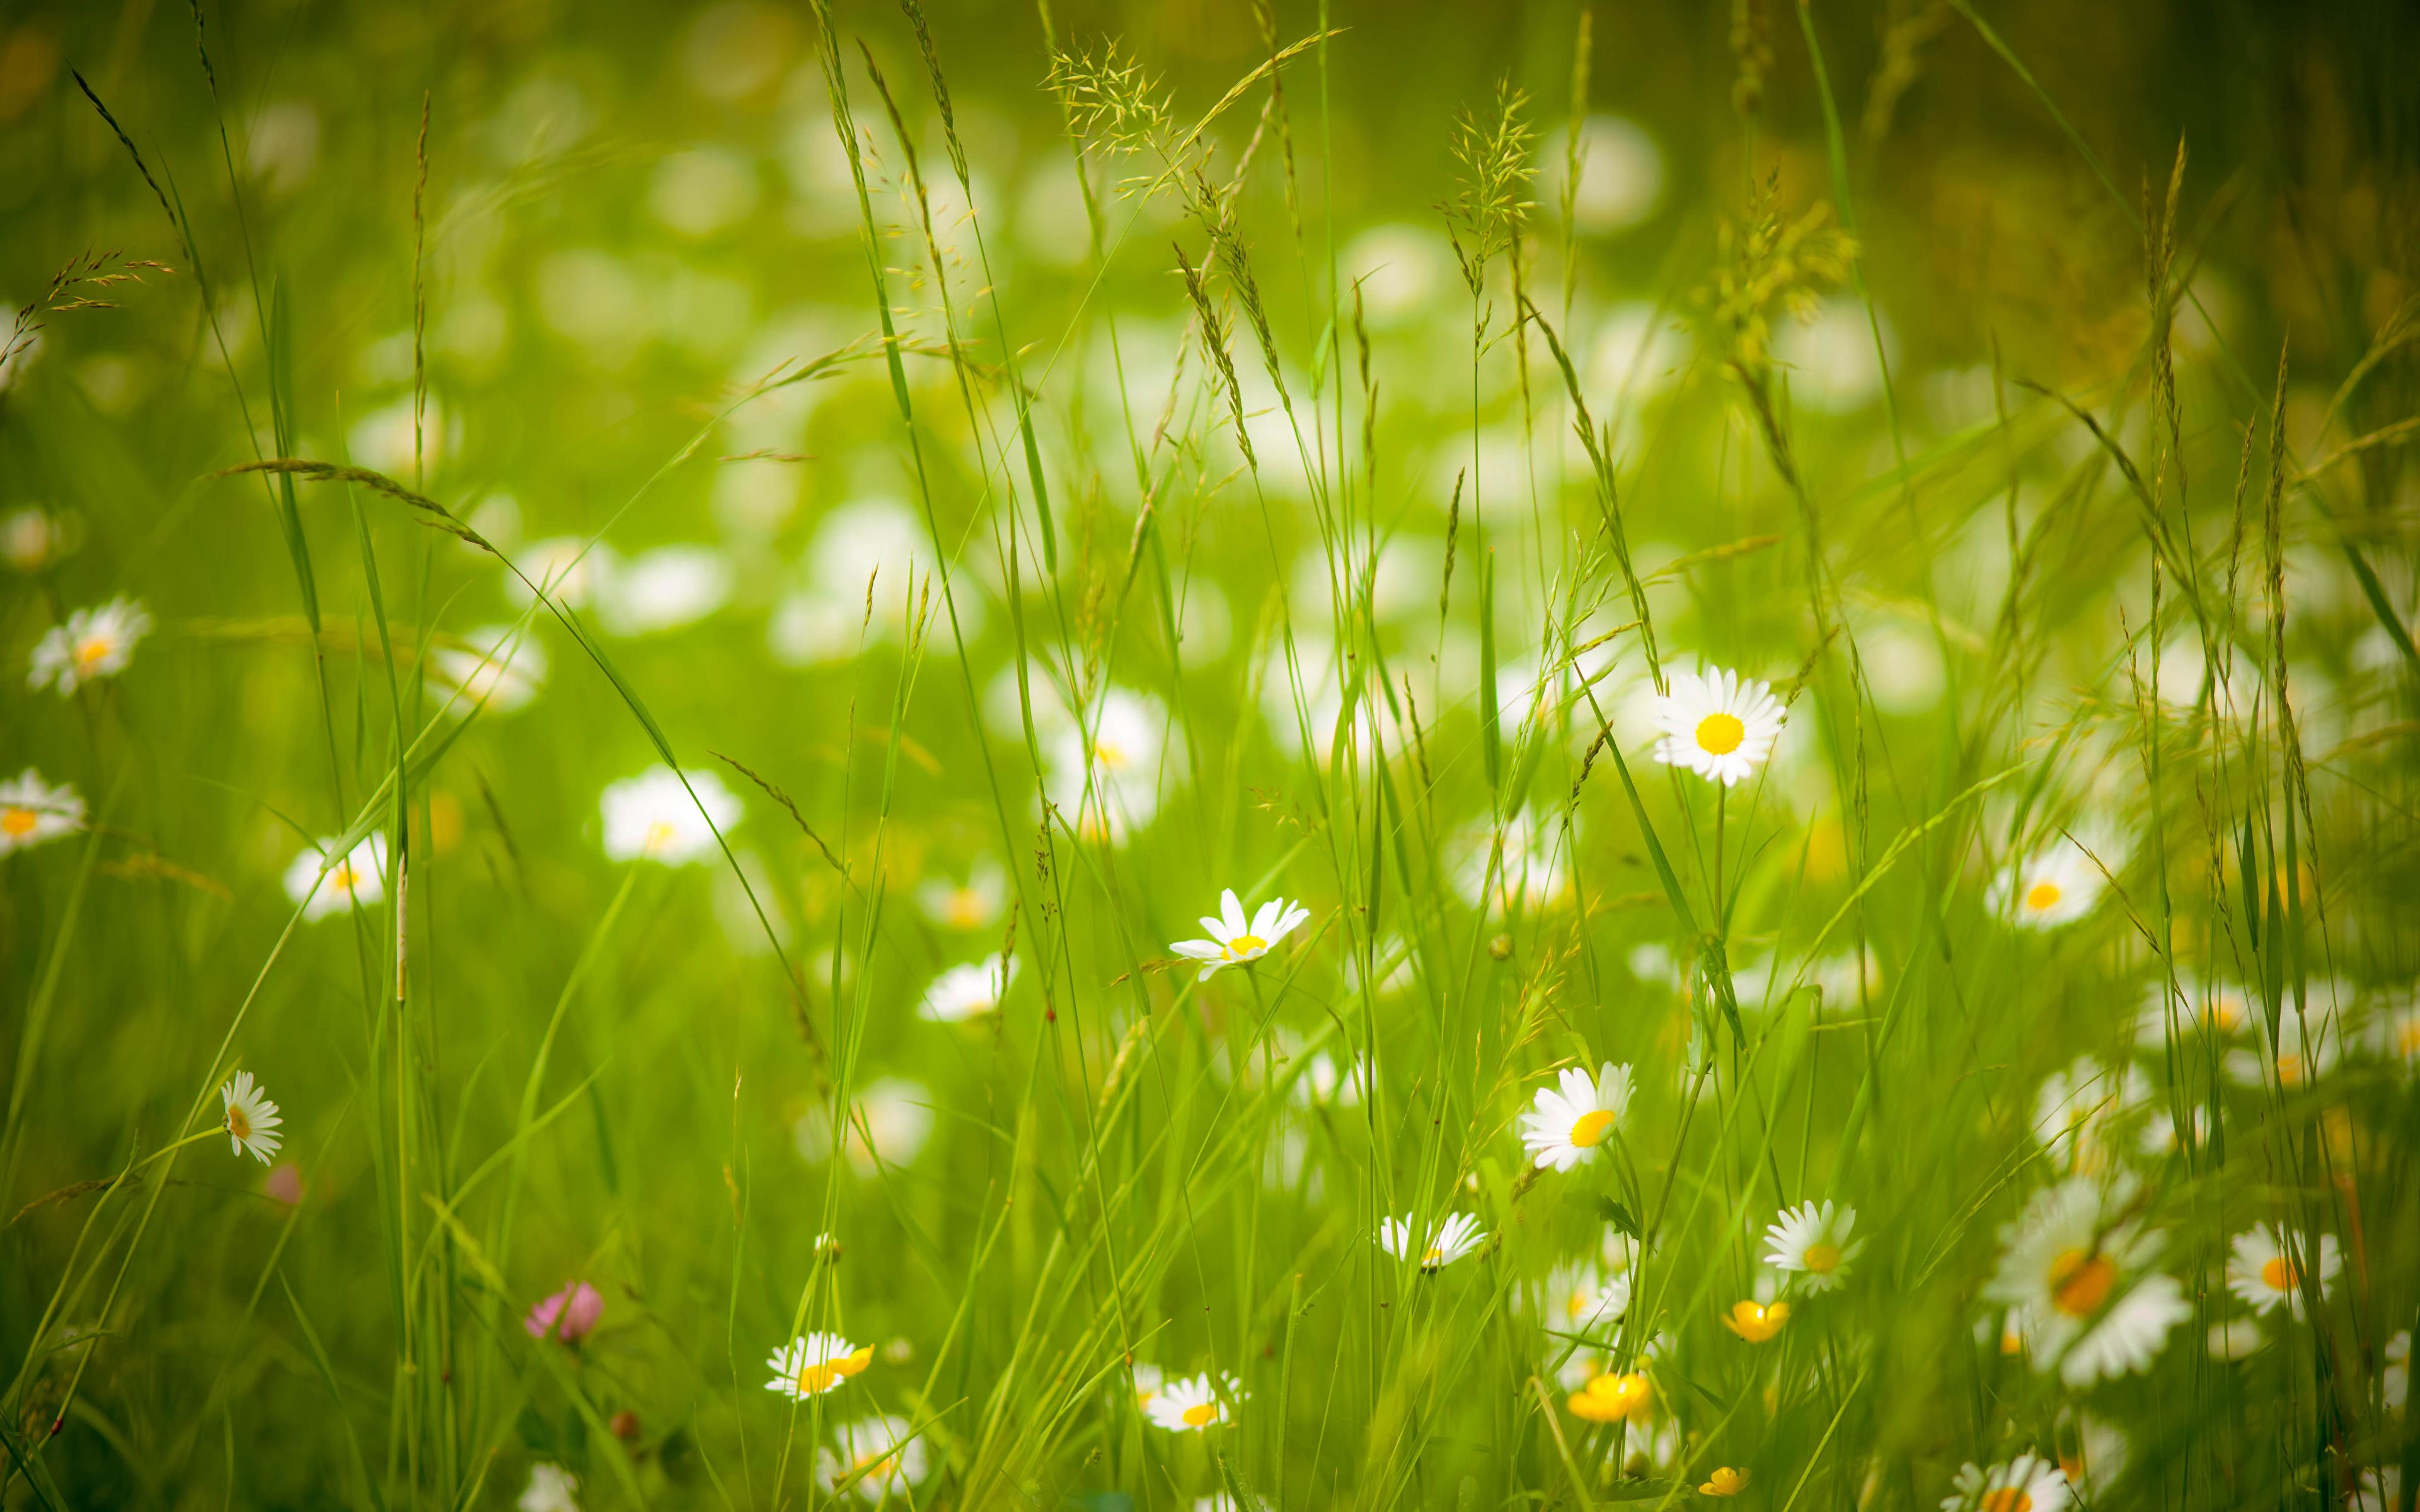 ромашки трава chamomile grass  № 3837867 загрузить